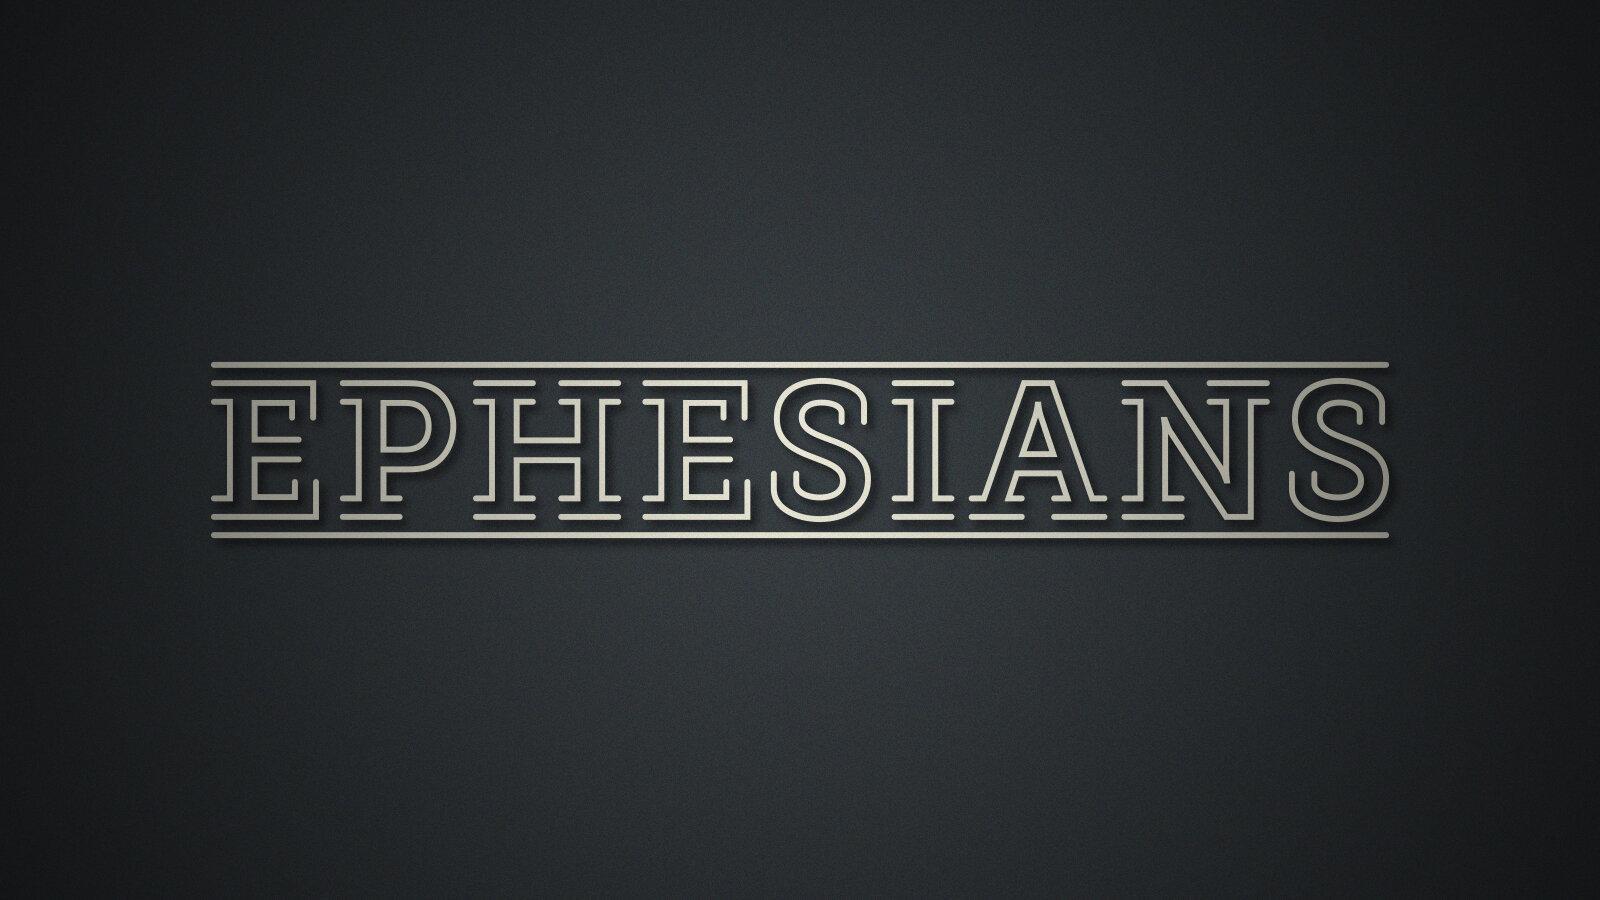 Ephesians_ws.jpg